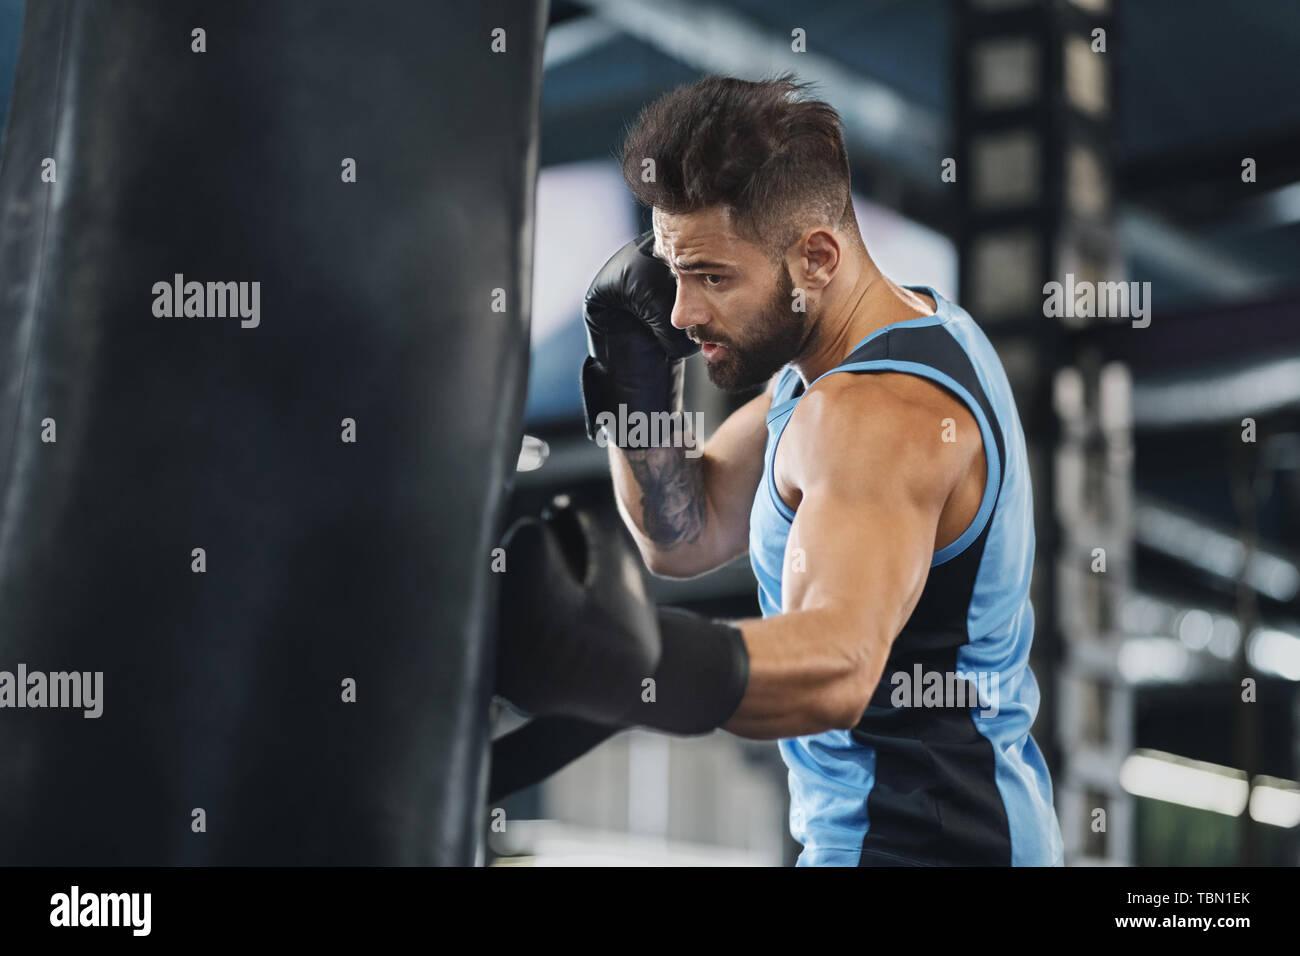 Active guy punching boxing bag at gym Stock Photo